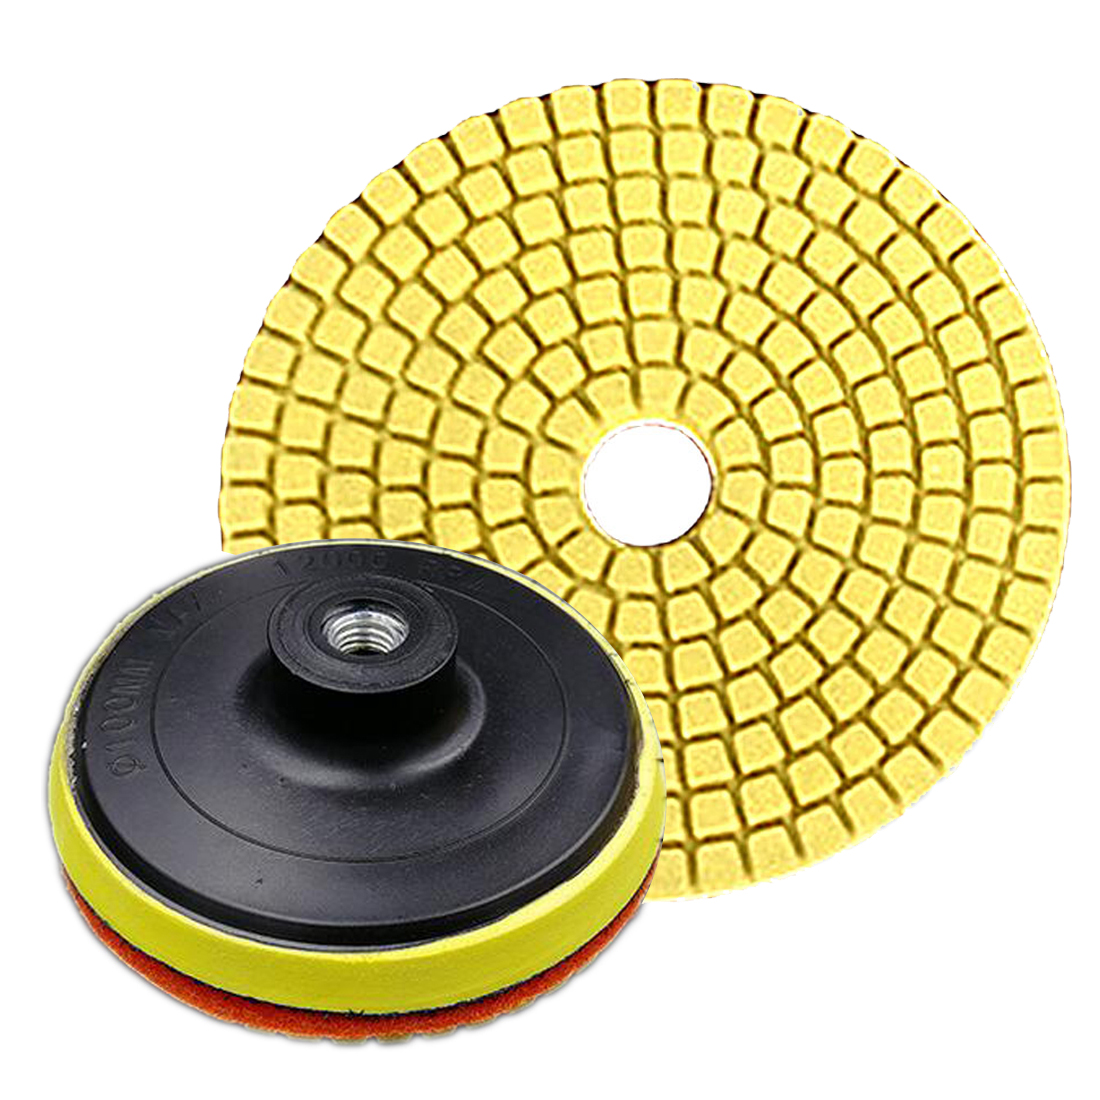 "Flexible Polishing Pads 100mm 4"" Wet Diamond Grinding Disc Polishing Pad For Granite Marble Stone Concrete Stone Grinding Disc"